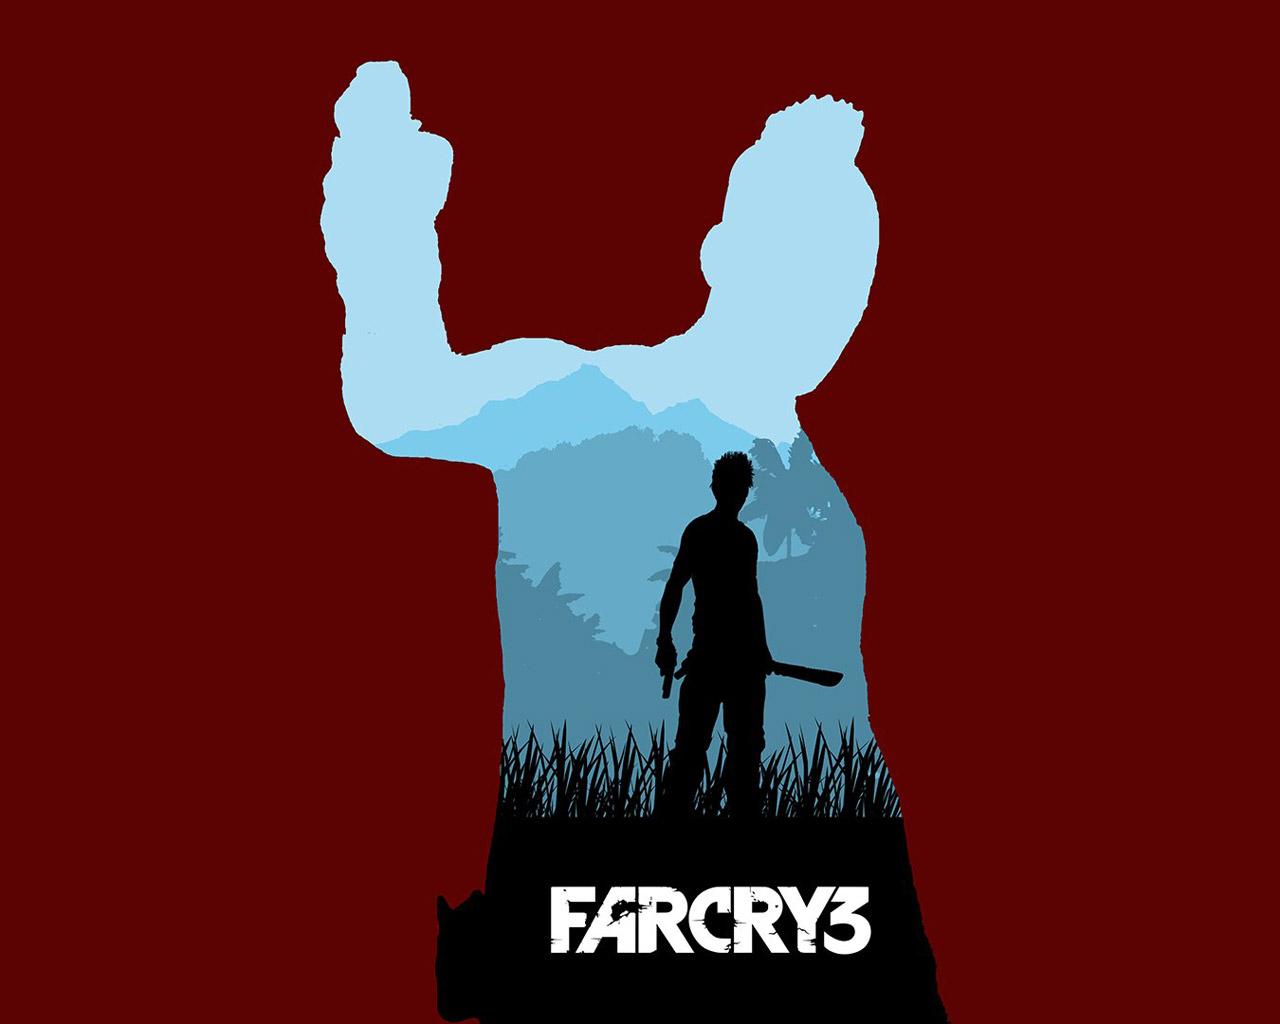 Free Far Cry 3 Wallpaper in 1280x1024